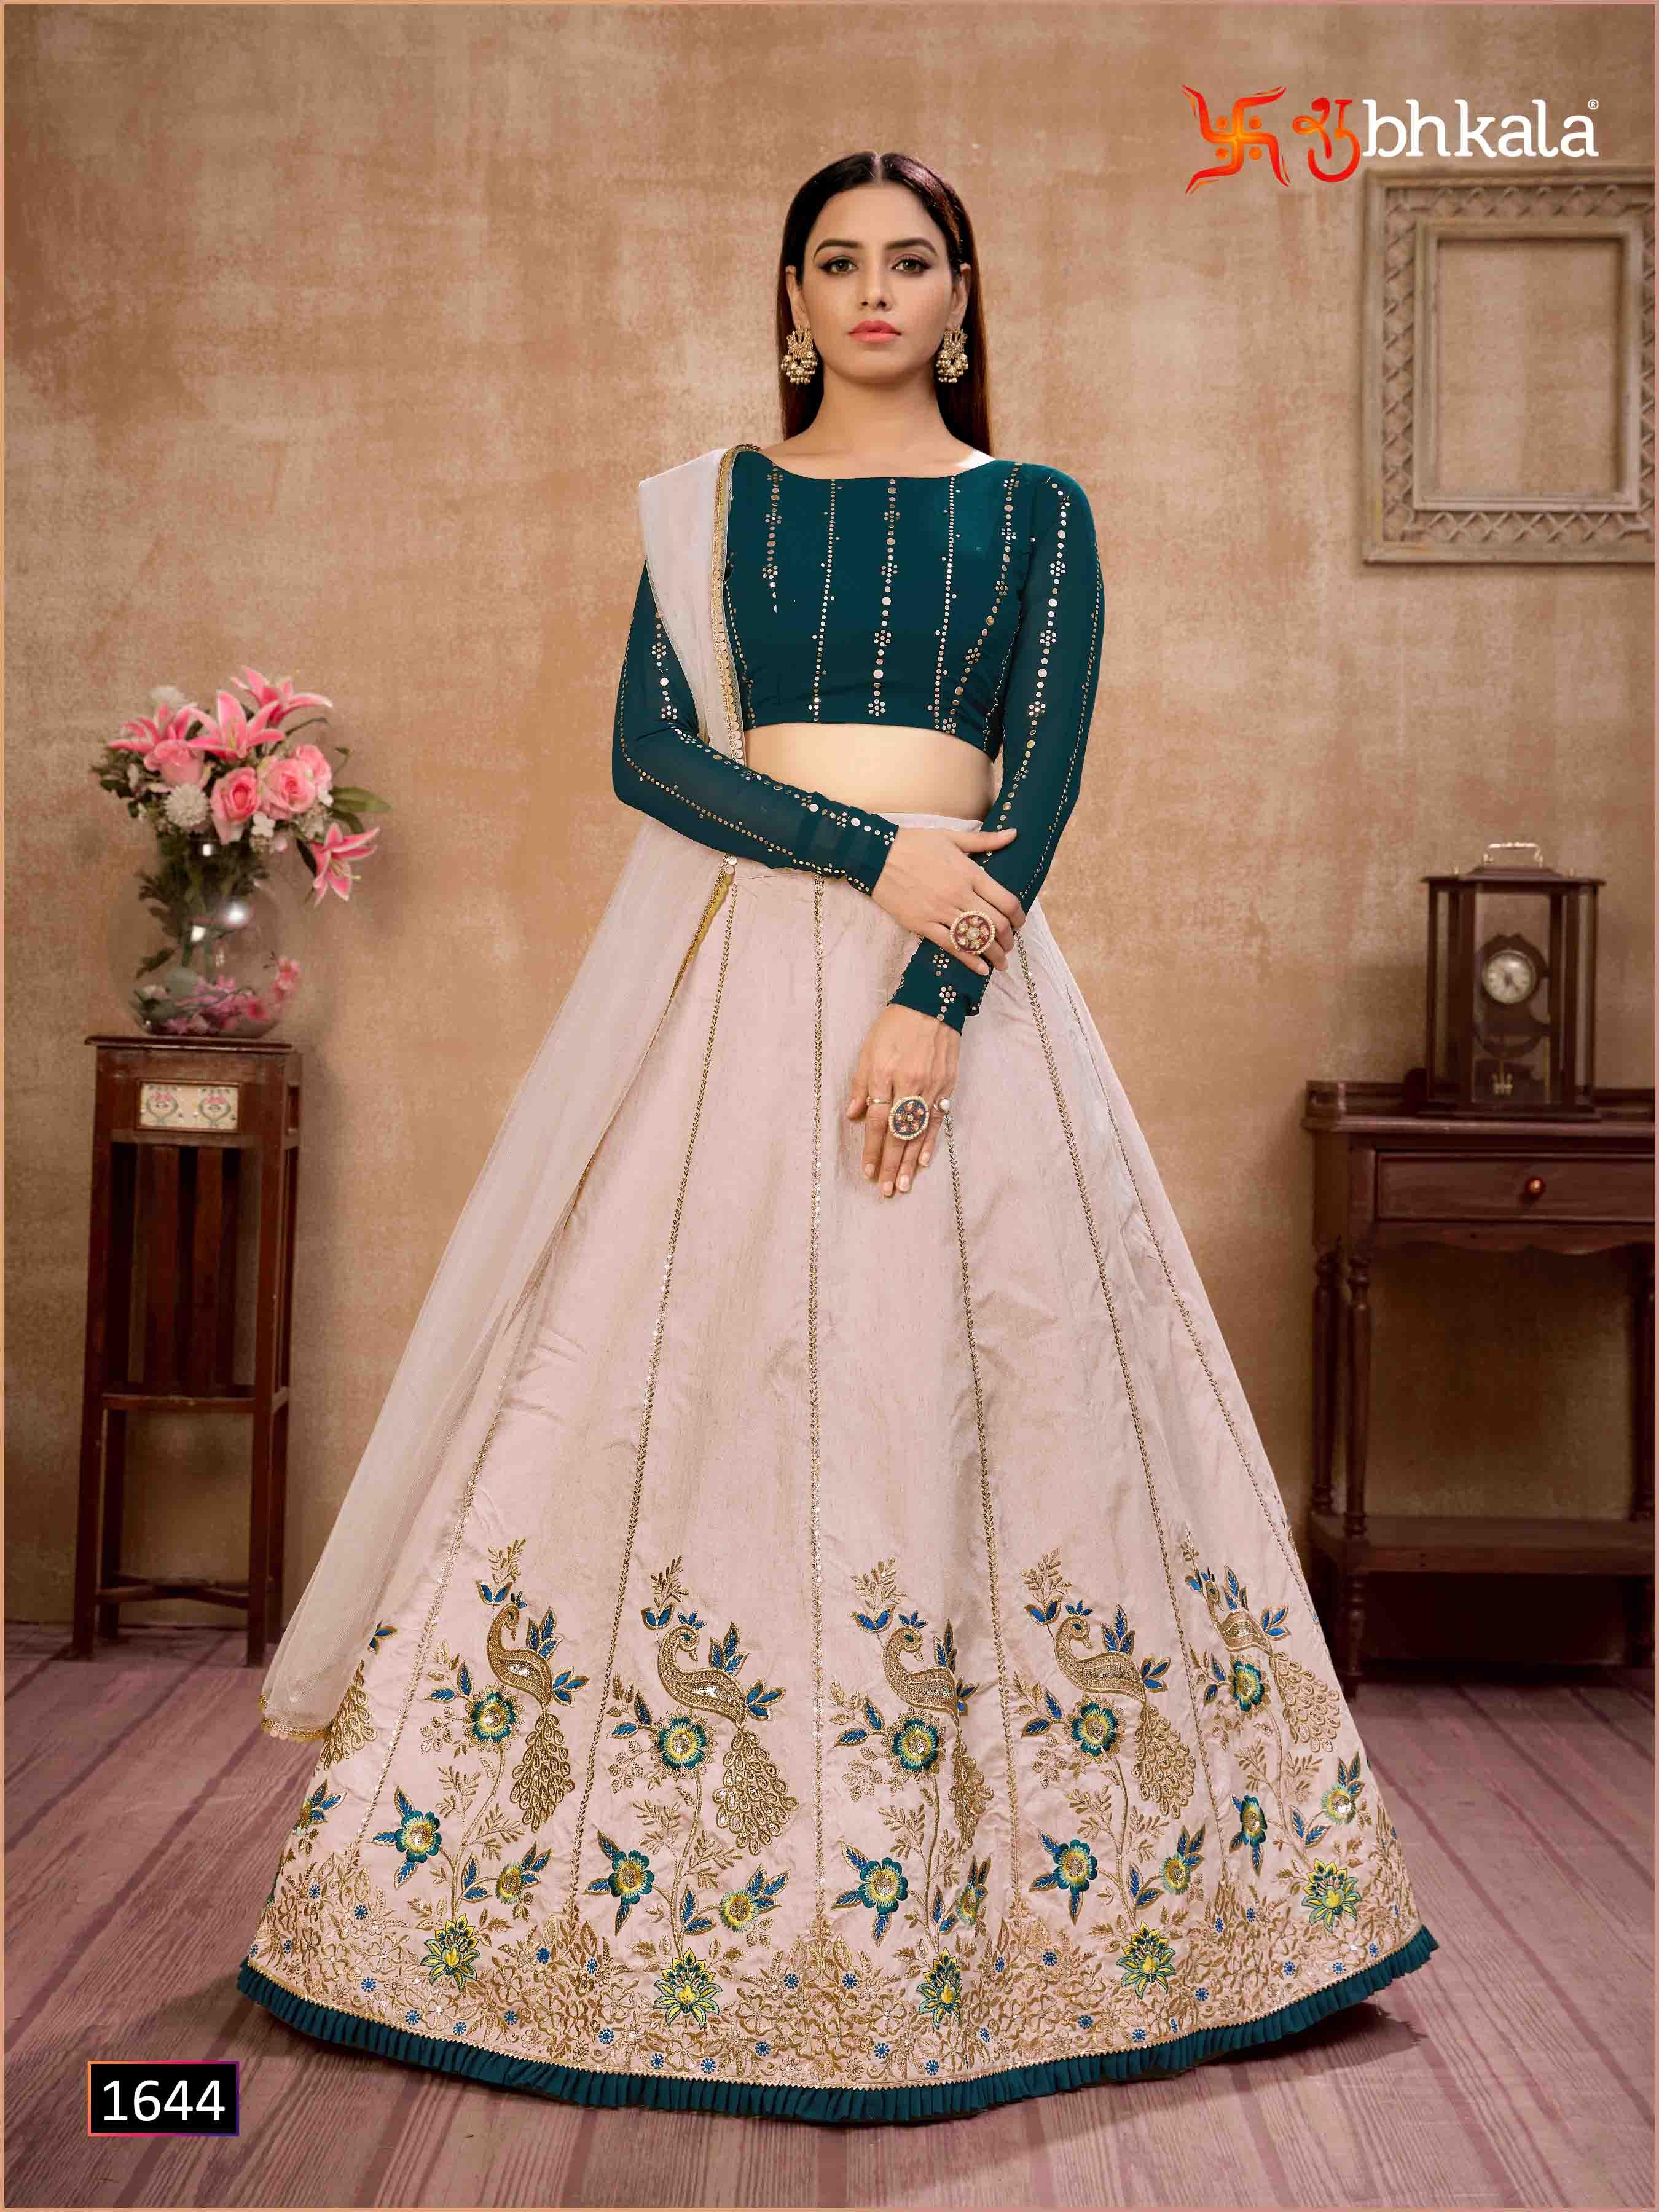 Kf Girly 1644 Buy Latest Designer Lehenga Choli Online